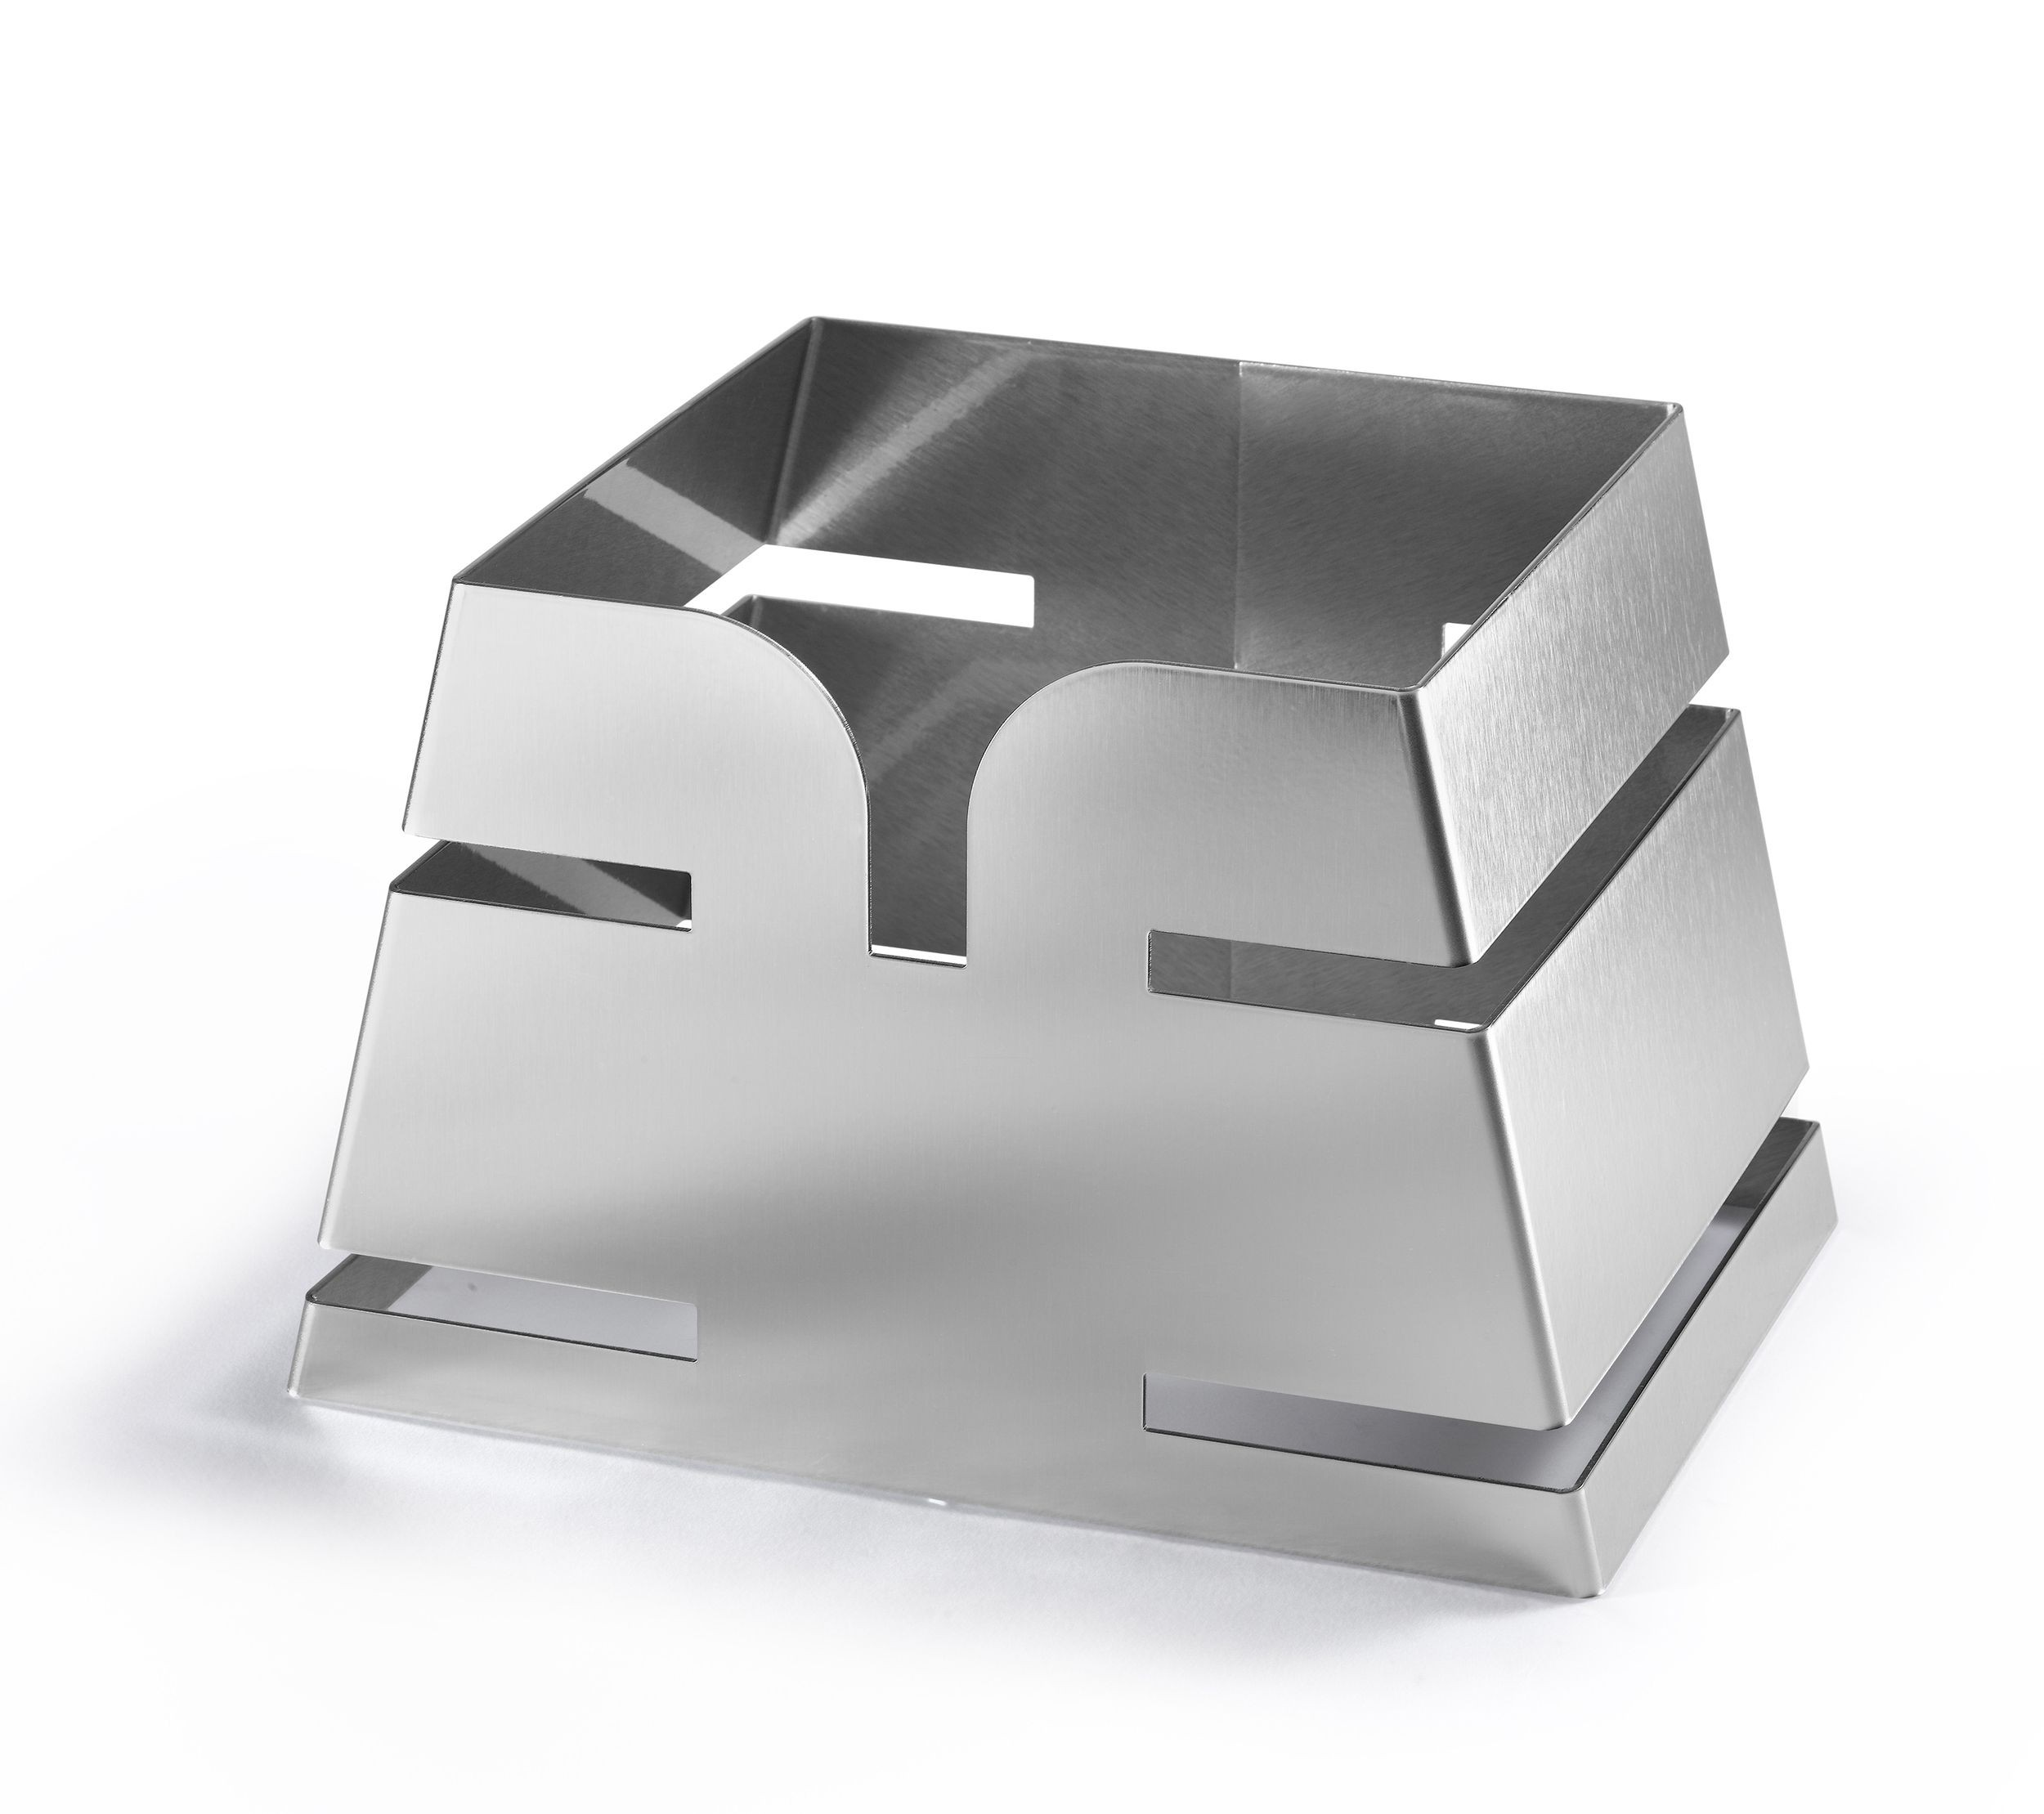 "Rosseto LD135 Large Pyramid Stainless Steel Skycap Riser 11.65"" x 8.3"" x 7.5""H"